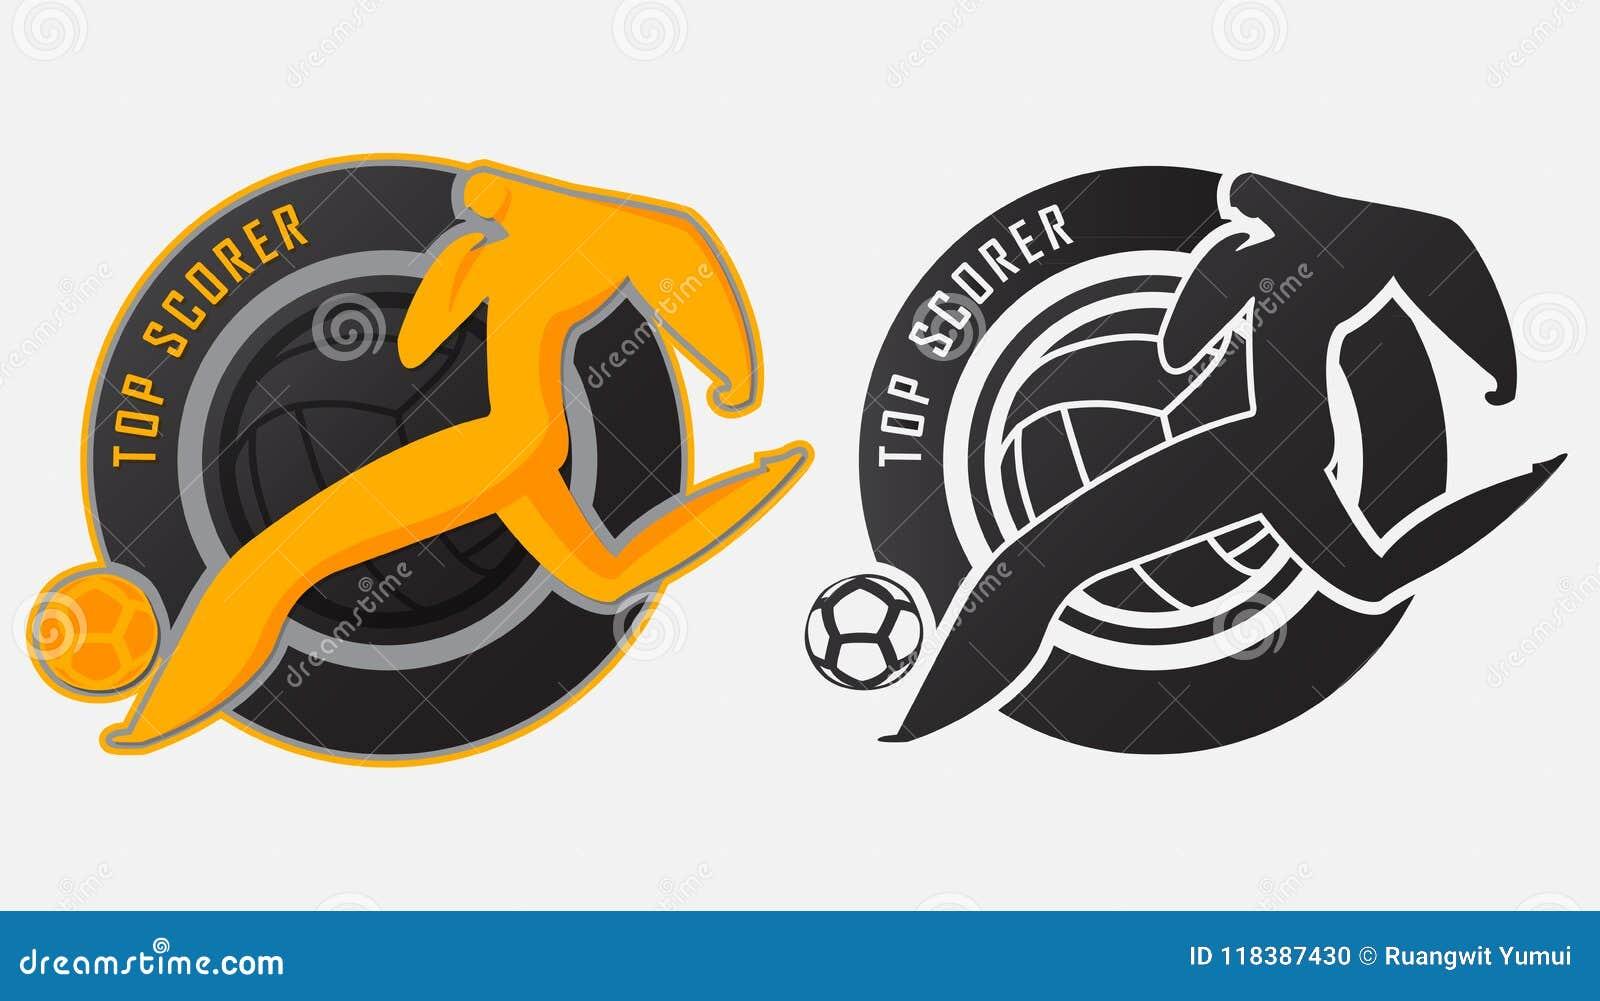 Printtop Scorer Trophy Best Soccer Player Or Football Player Award